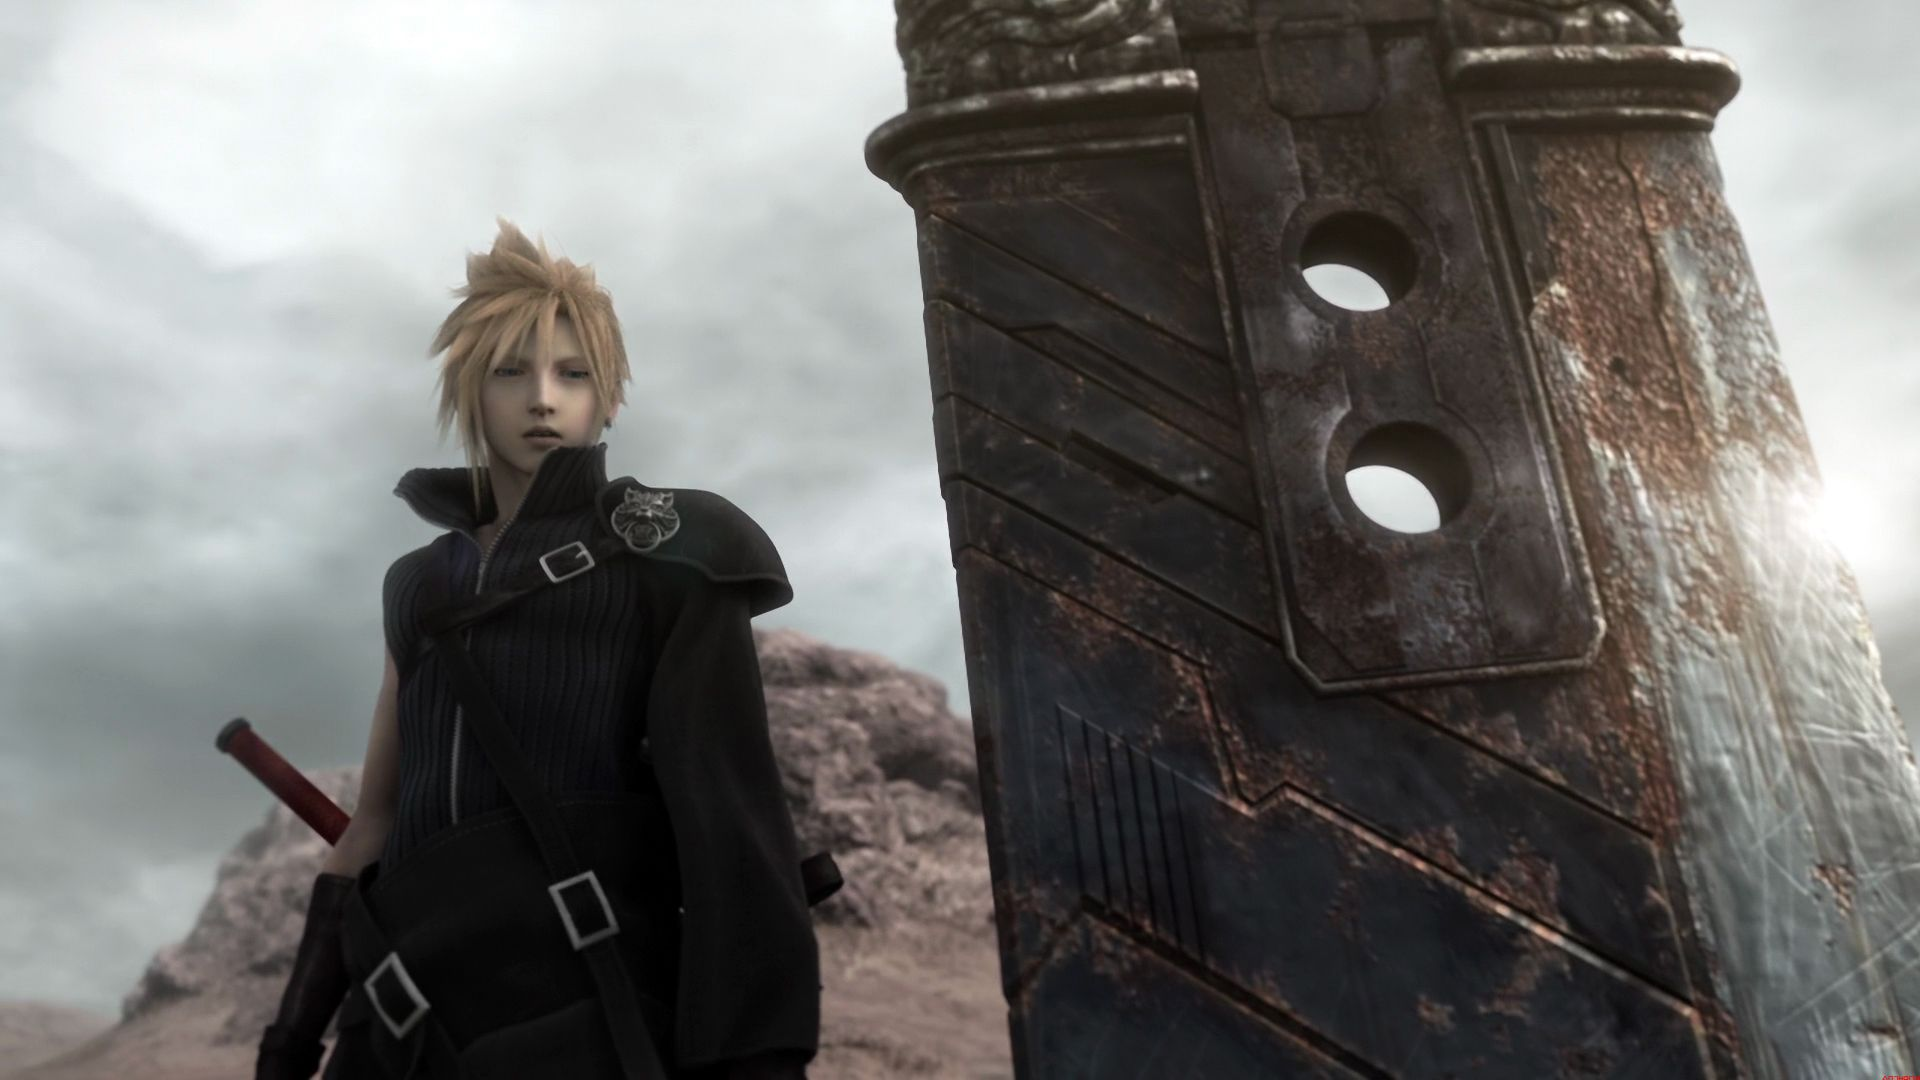 Cloud Strife Remake Of Final Fantasy